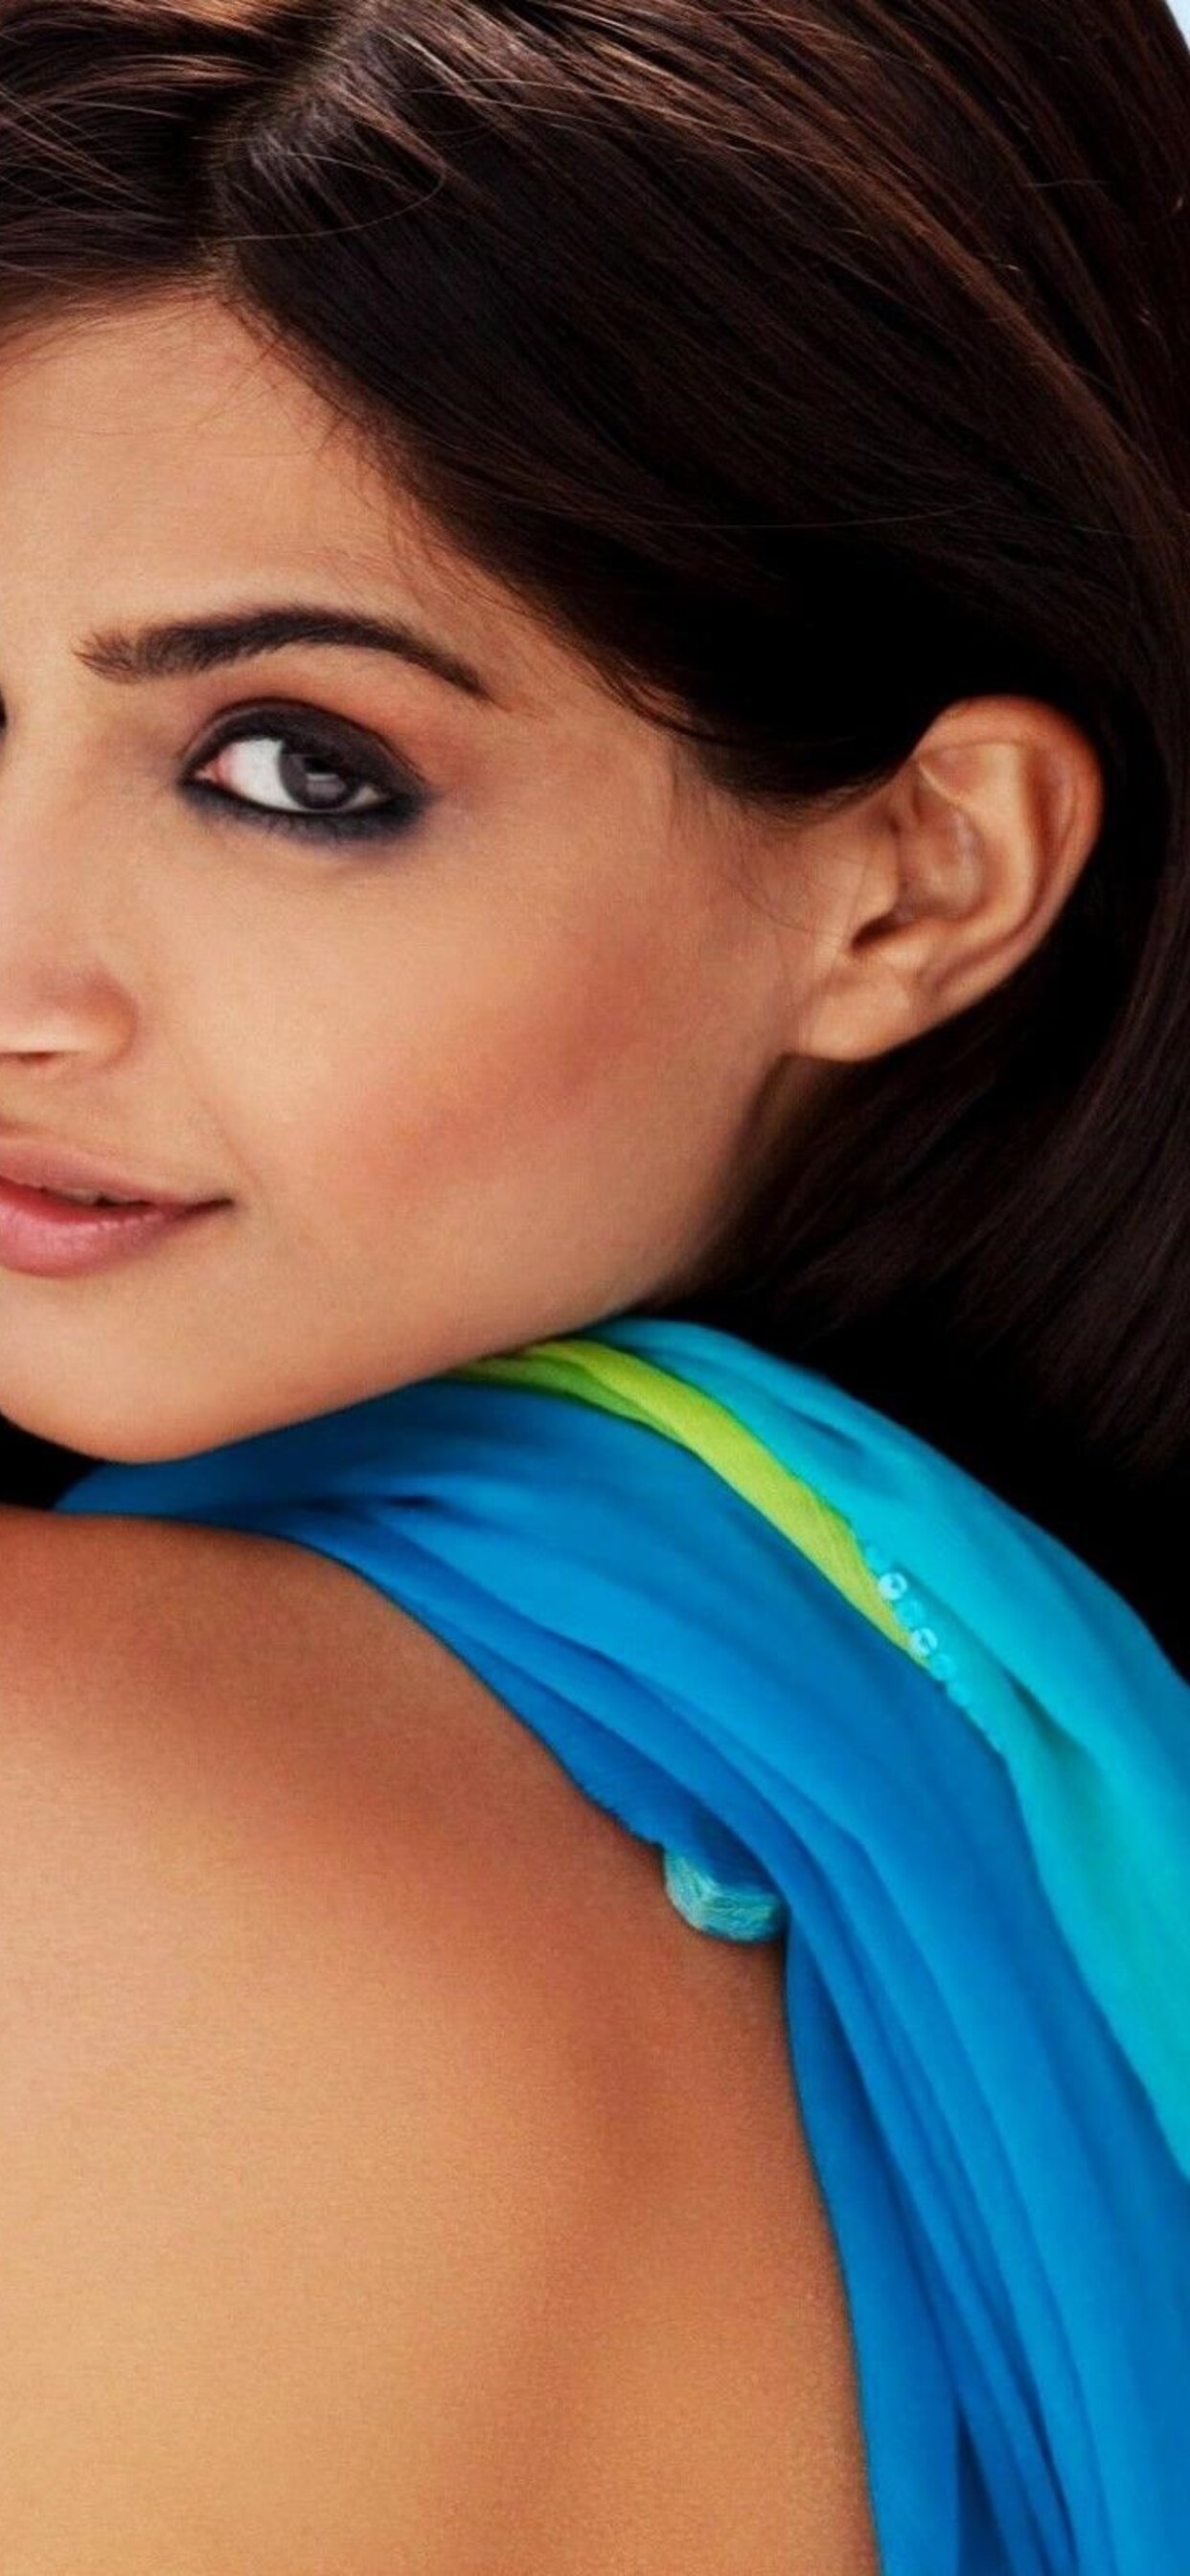 sonam-kapoor-hot-photoshoot-image.jpg